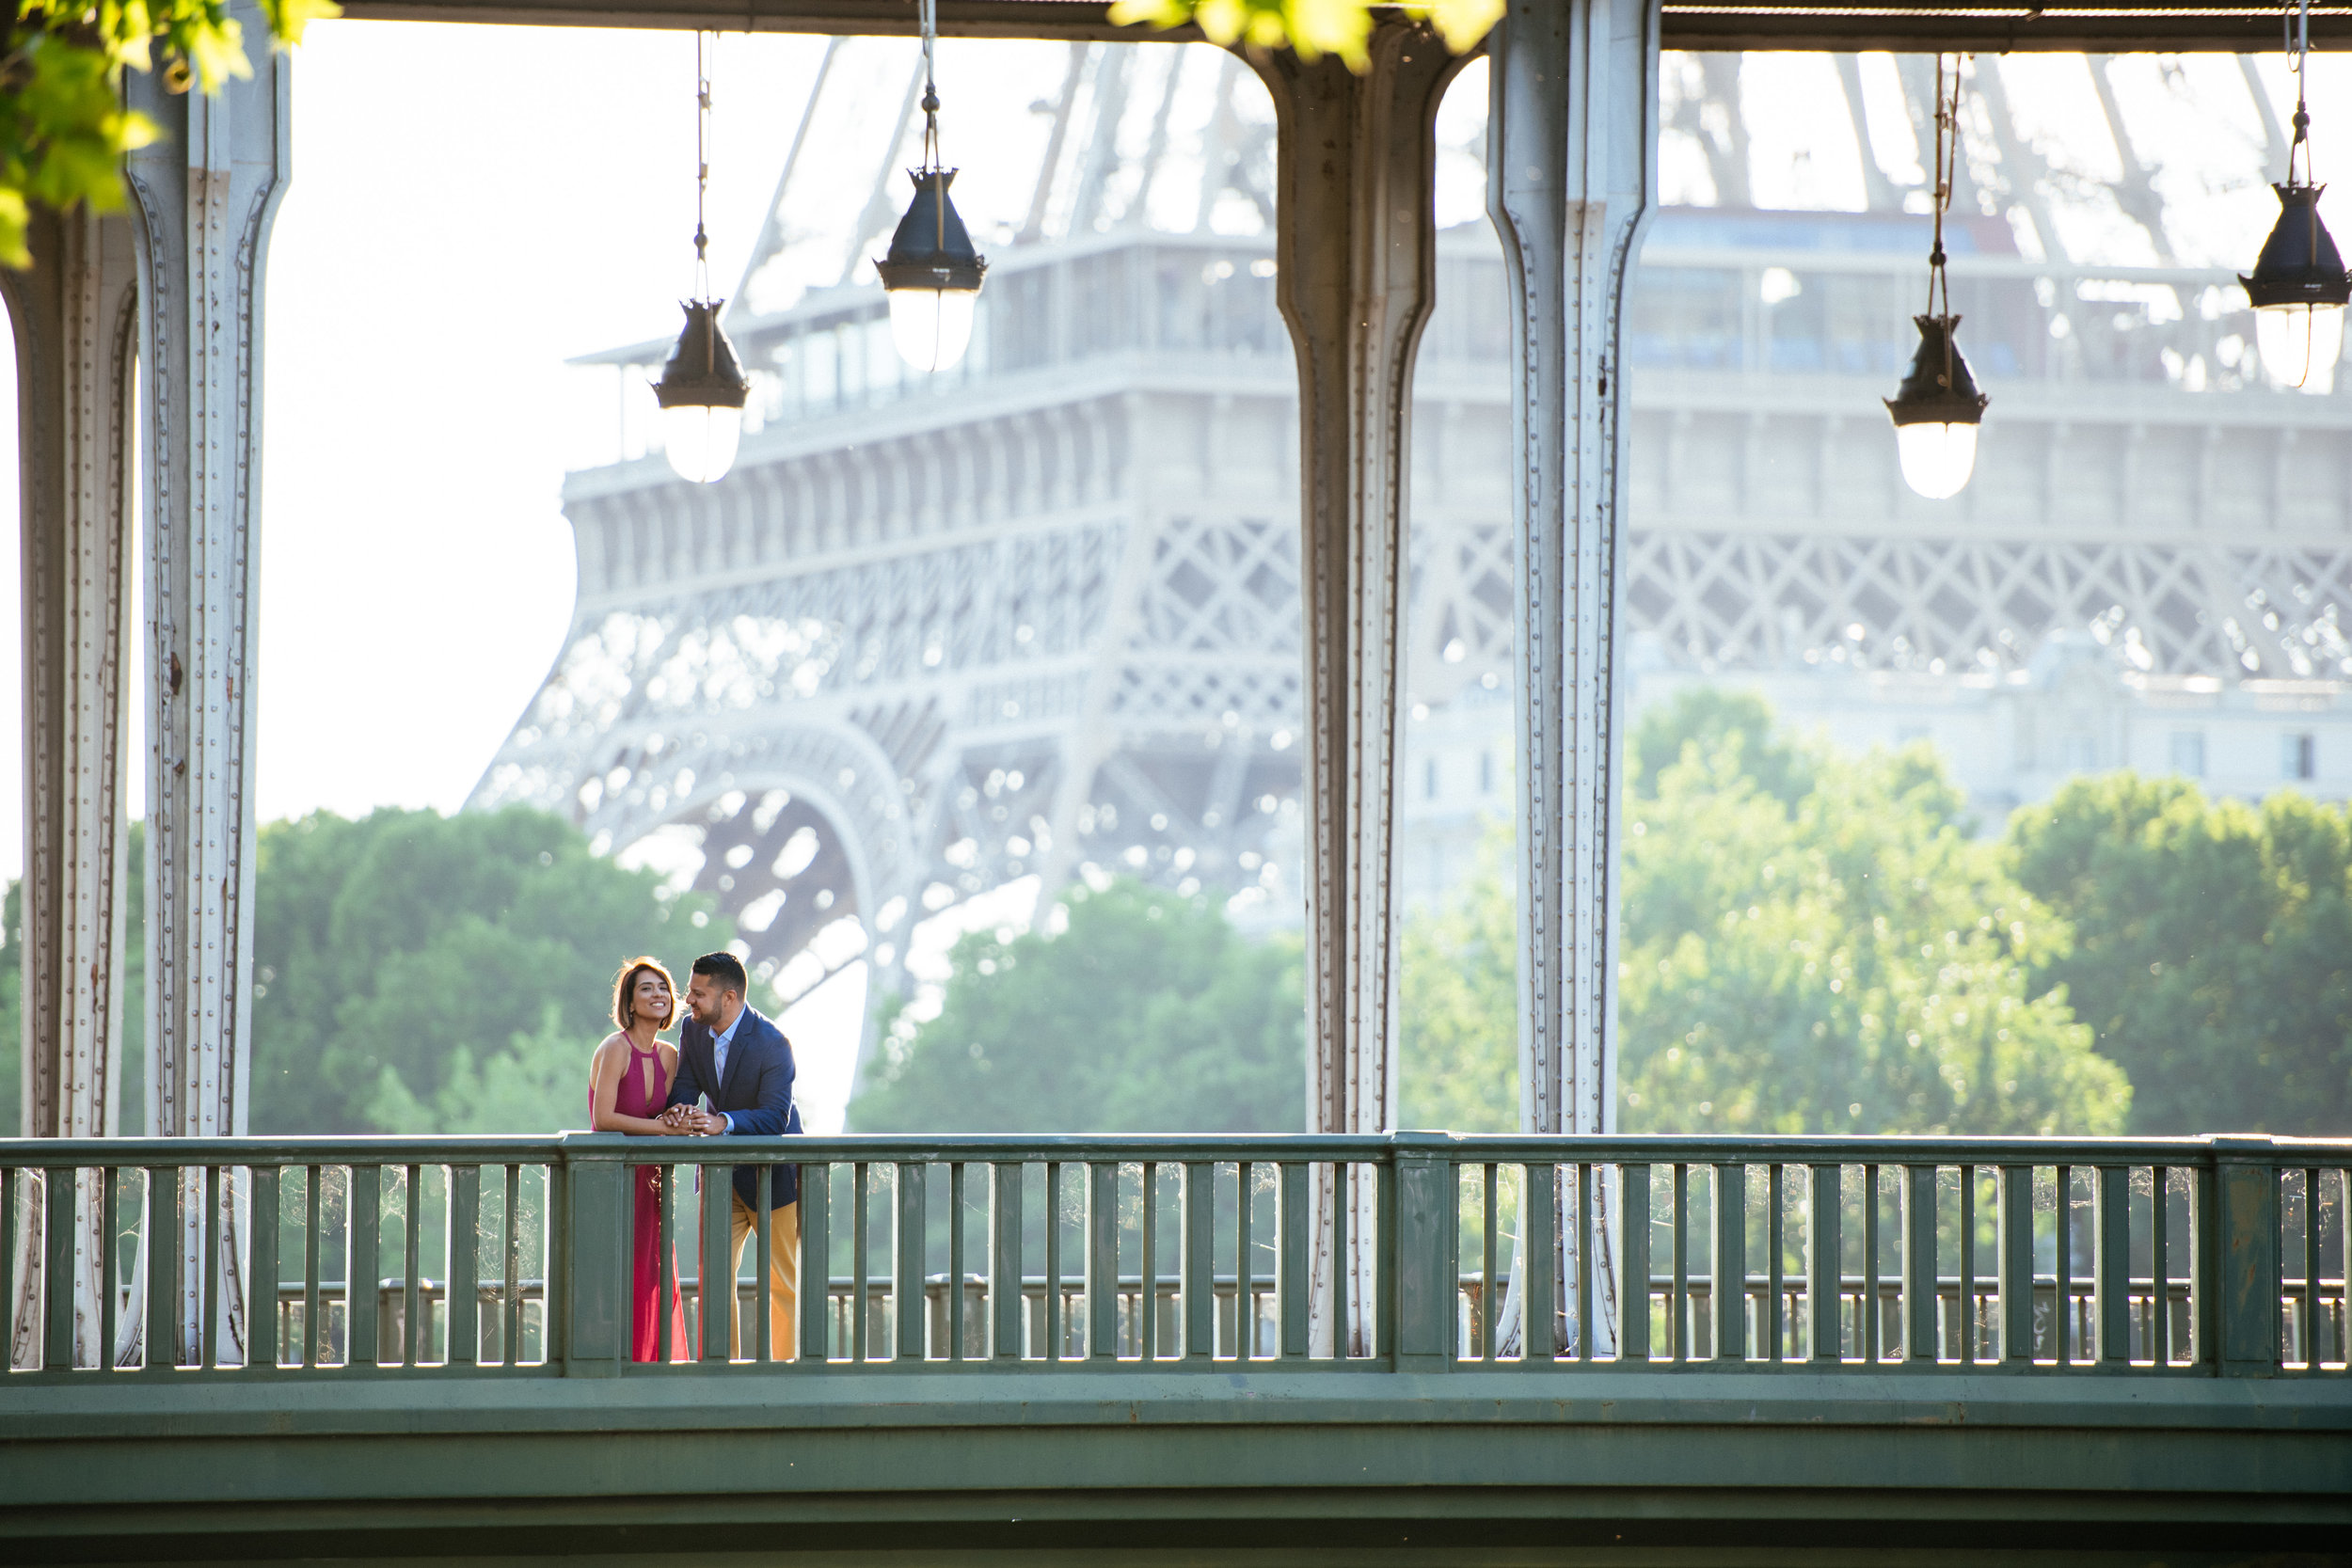 Paris Photoshoot for Wedding Anniversary.jpg